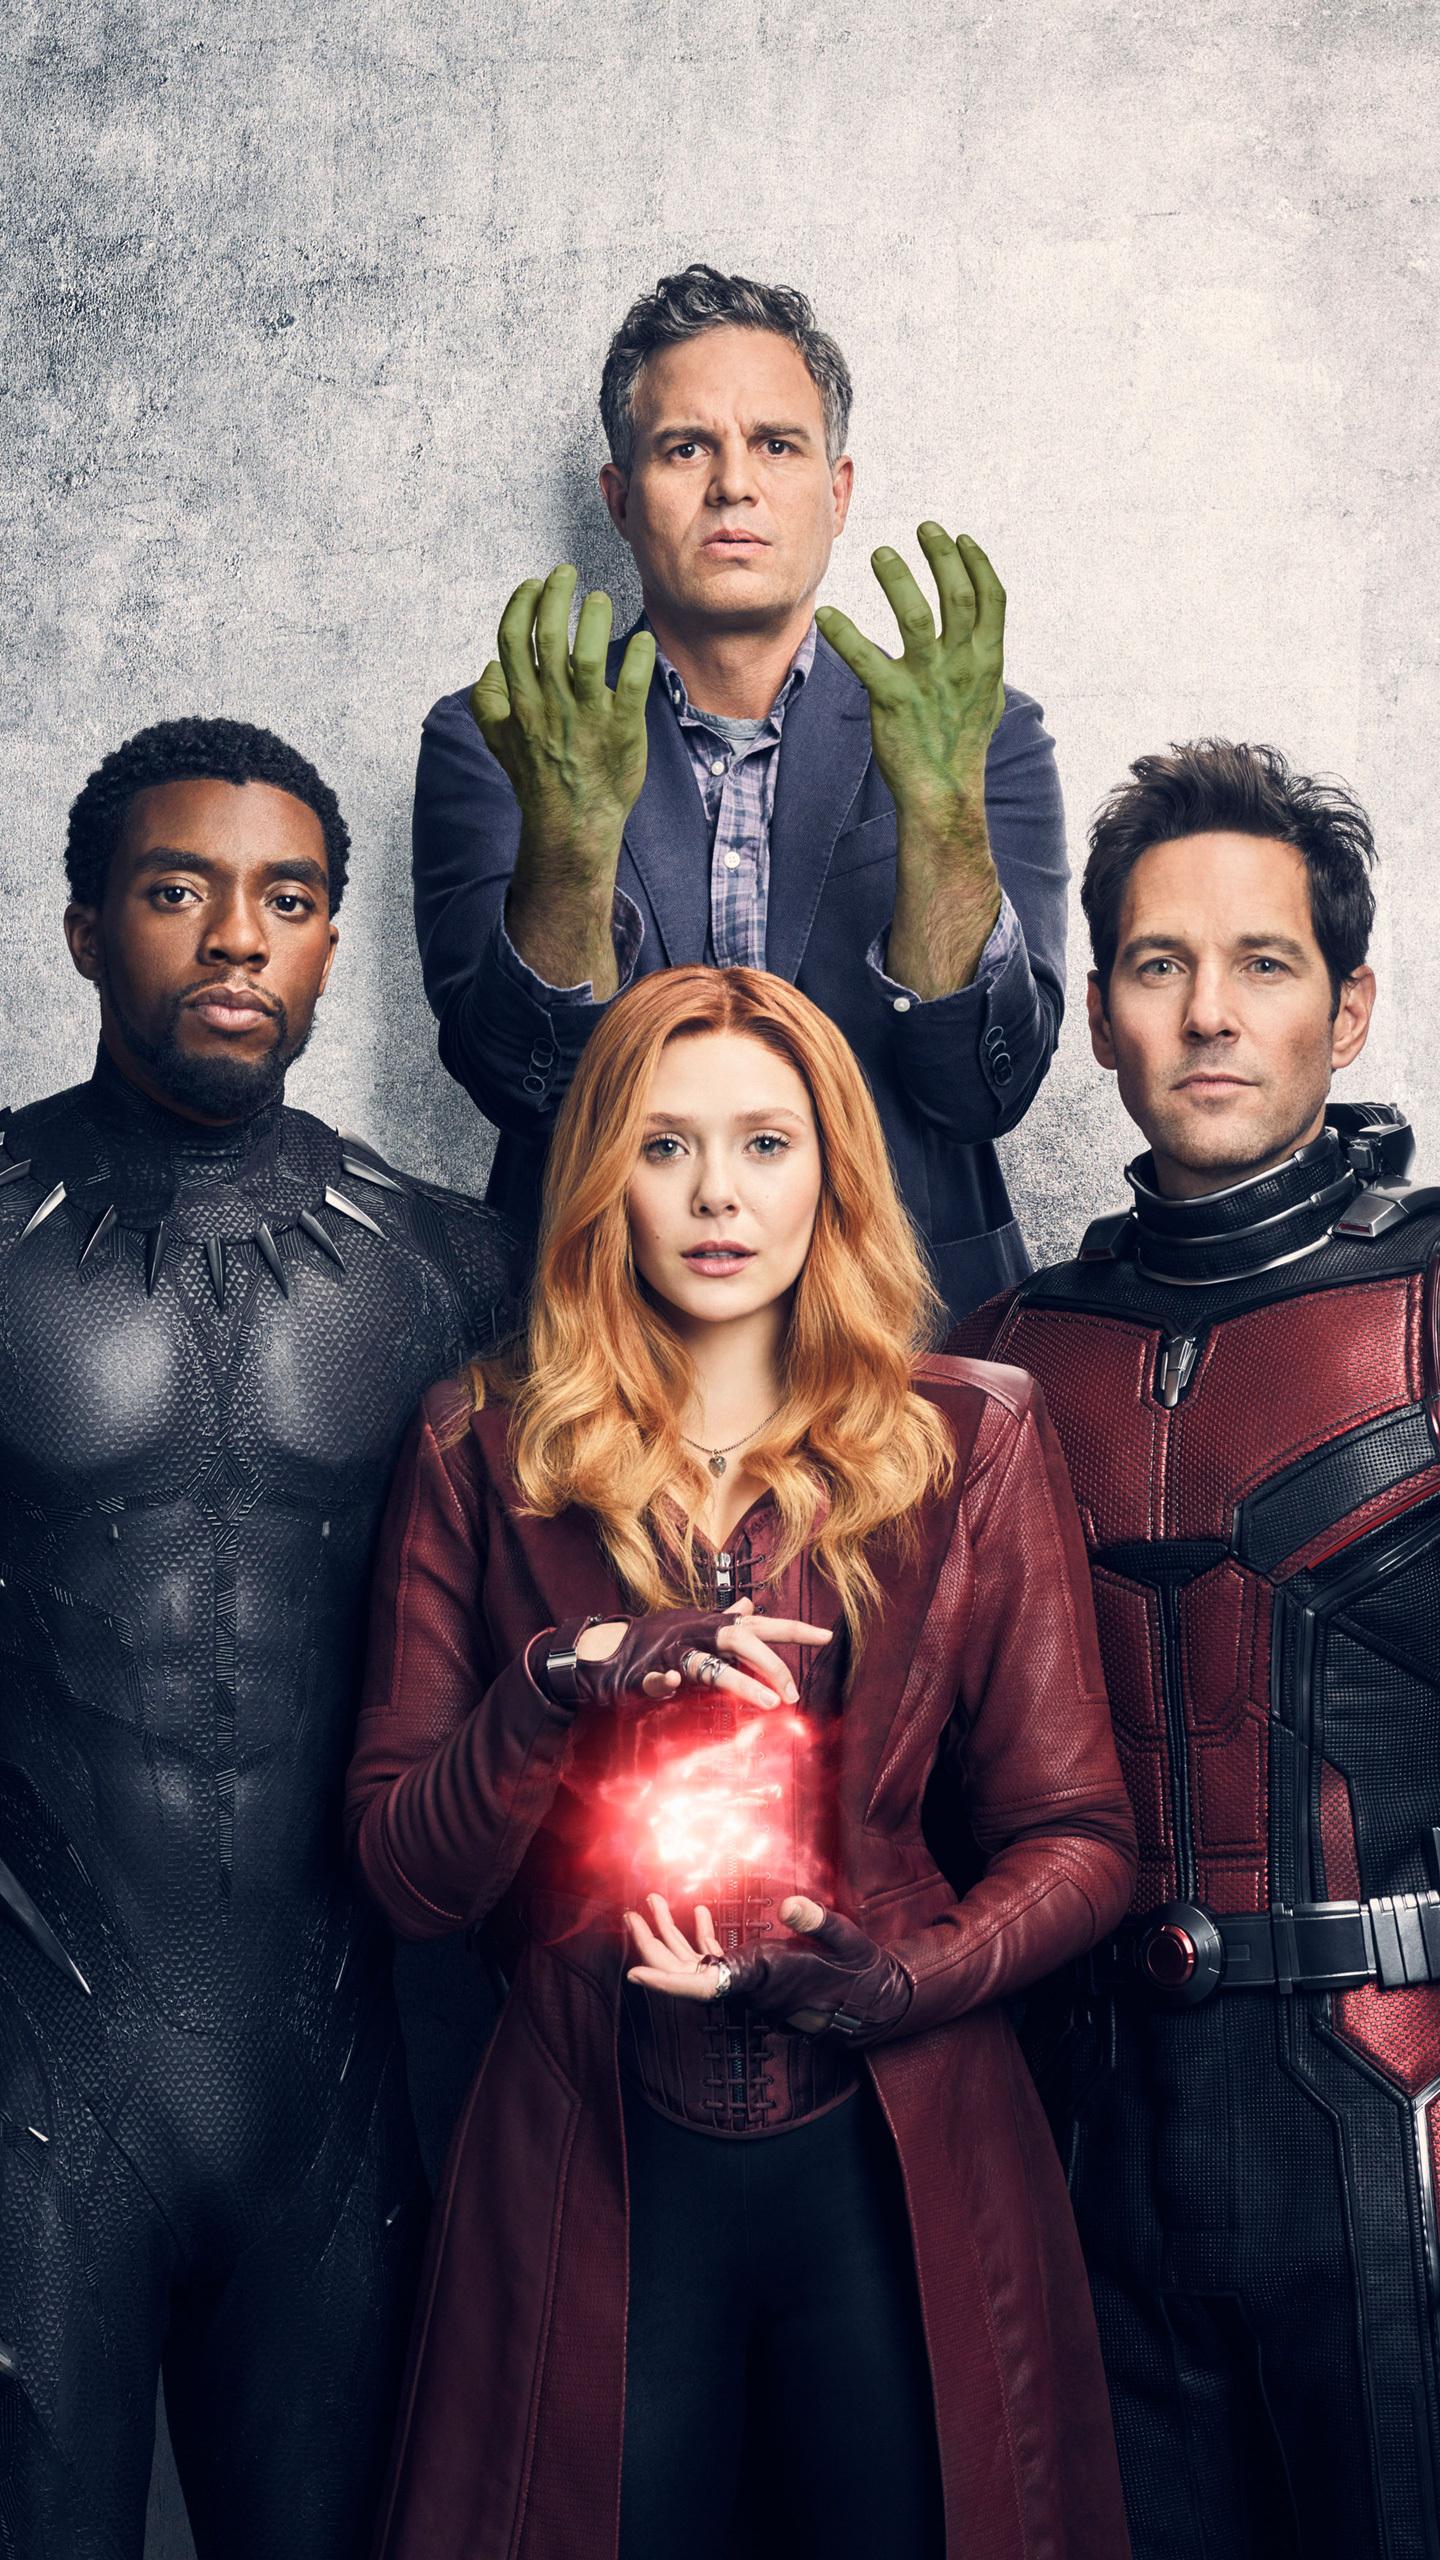 avengers-infinity-war-vanity-fair-cover-2018-photoshoot-6l.jpg